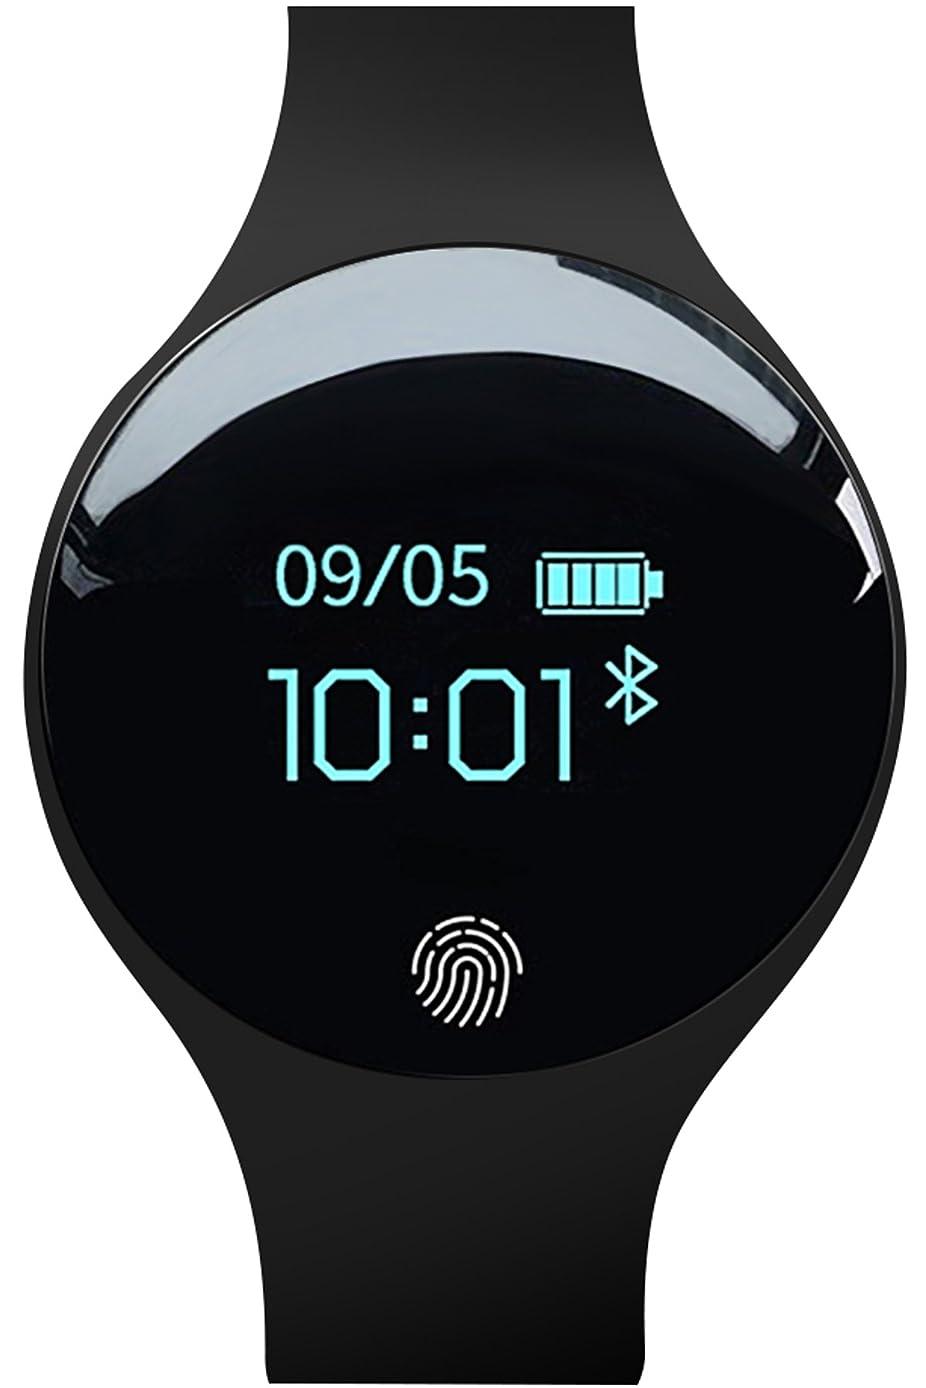 Fitness Tracker Watch Women Men Bluetooth Pedometer Activity Tracker IP67 Waterproof Android iOS Digital Smartwatch